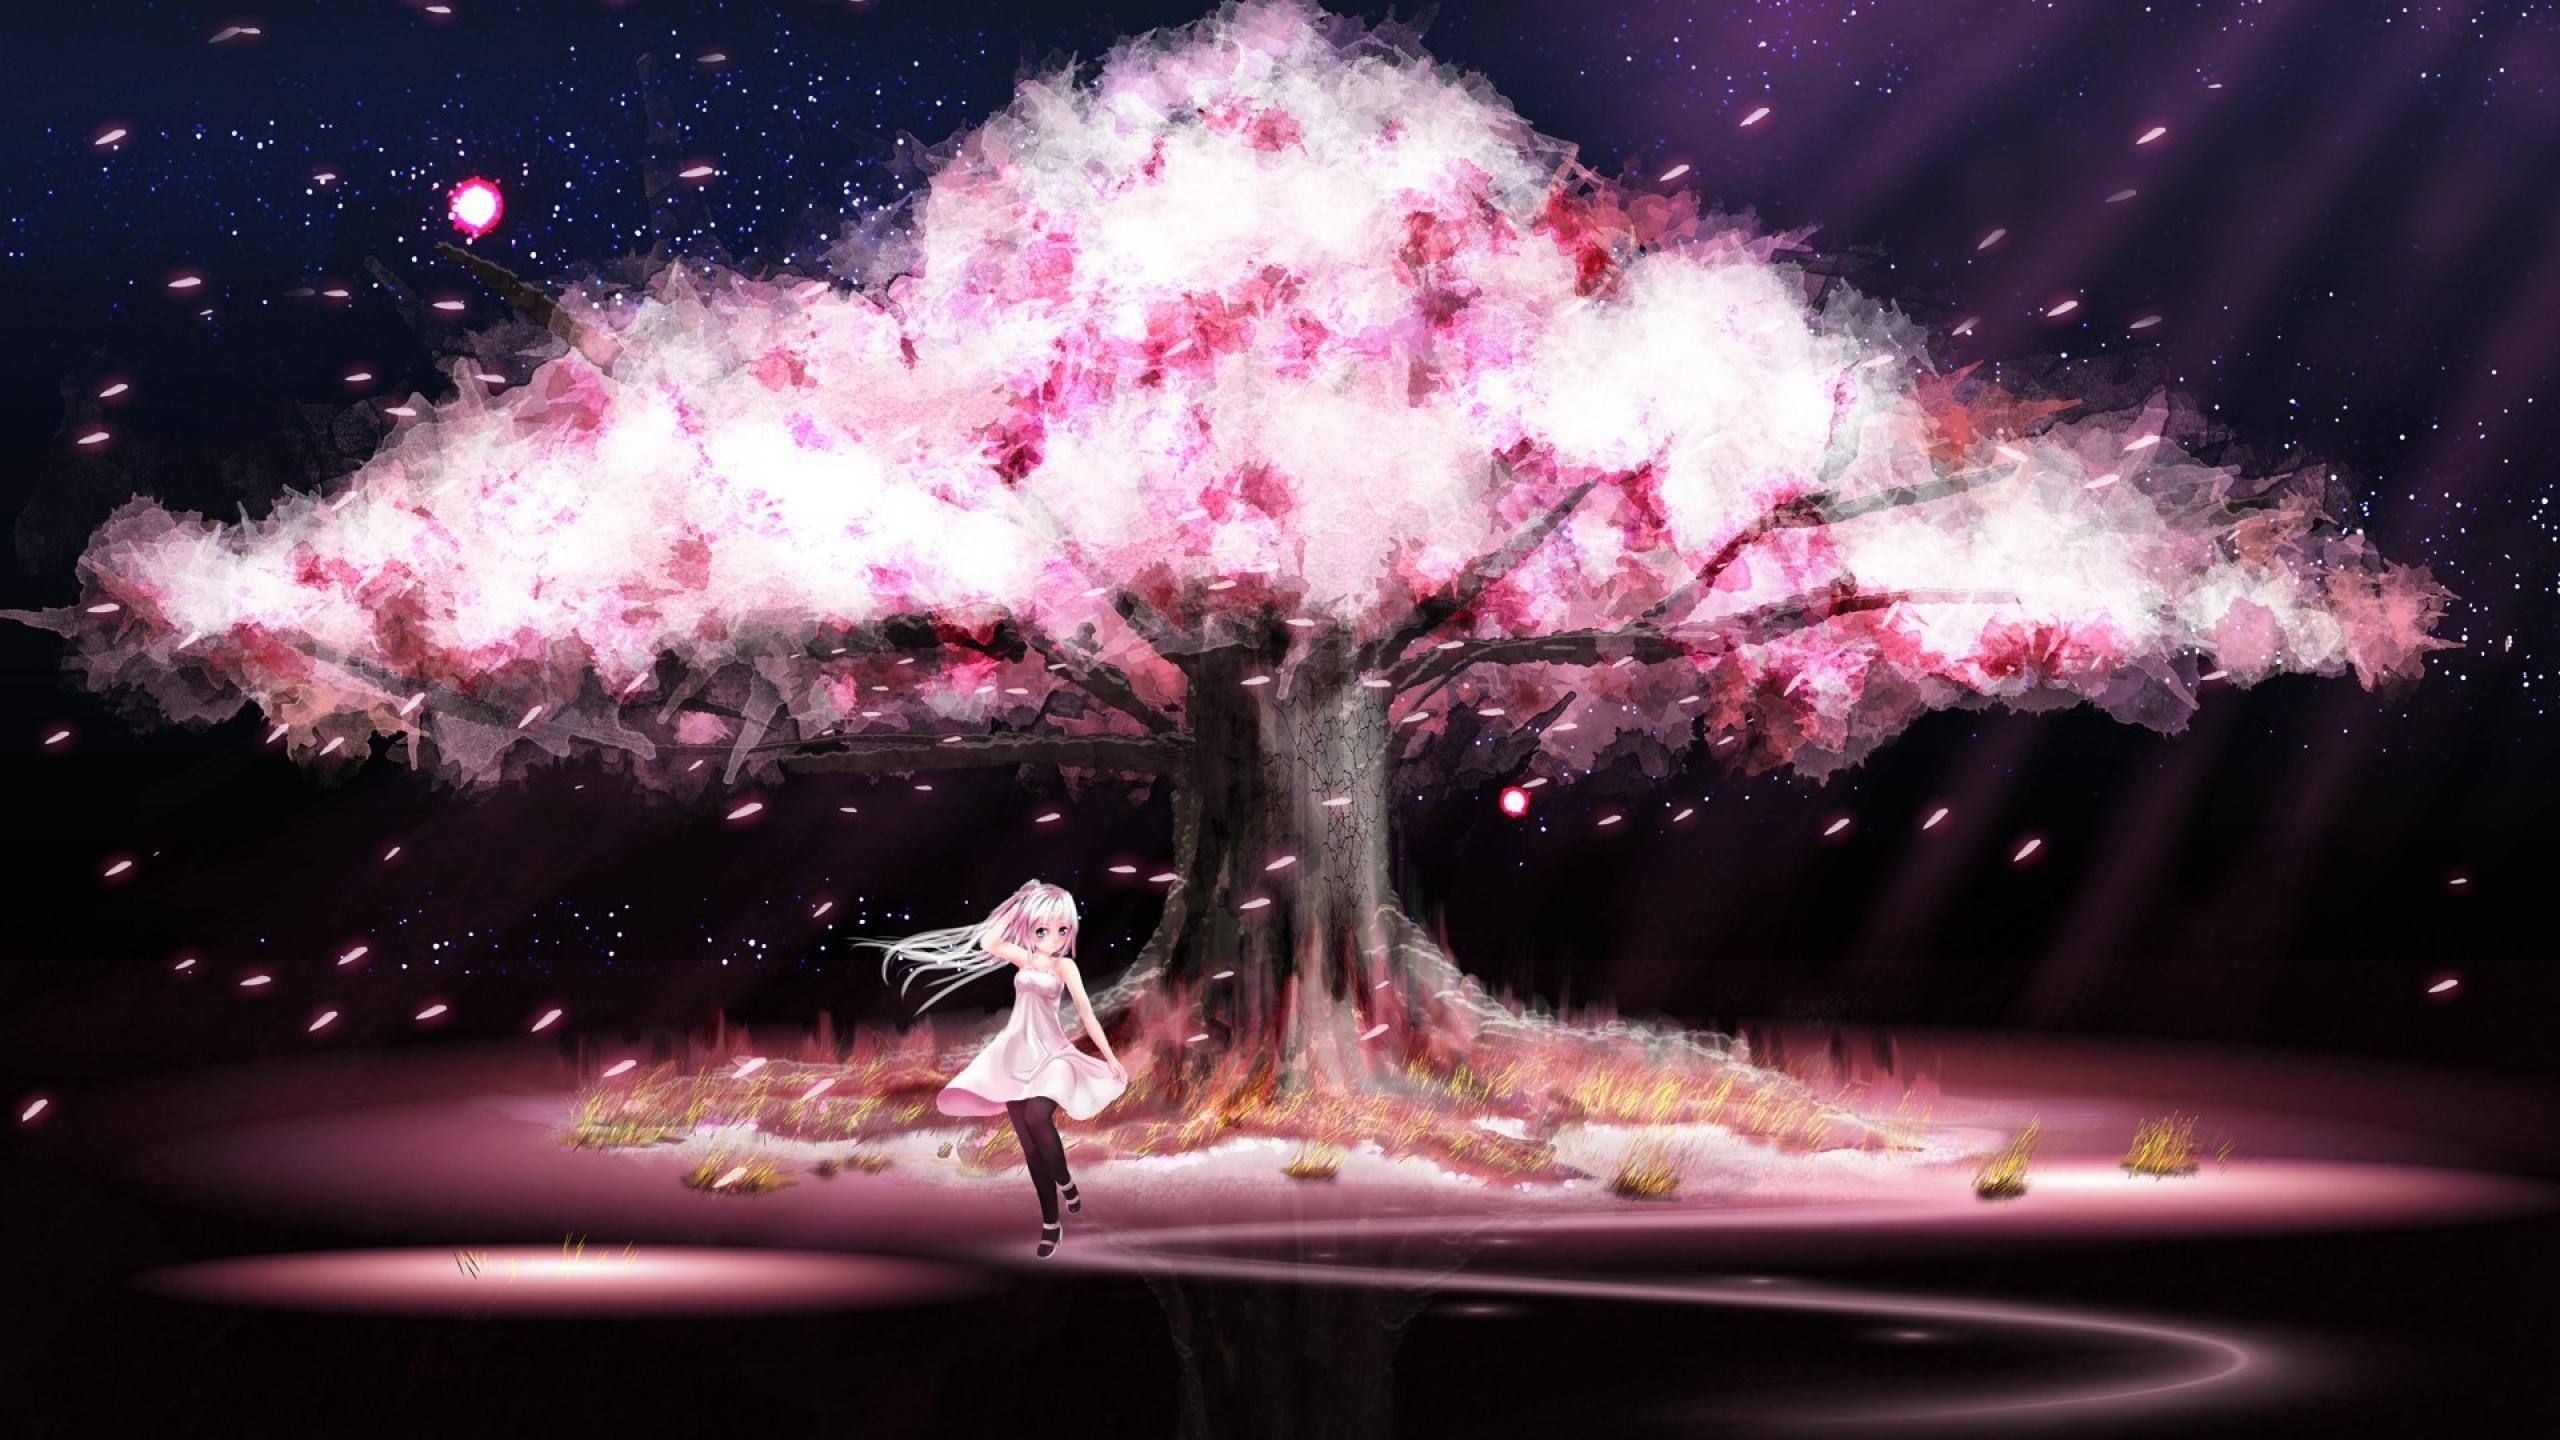 Sakura Cherry Blossoms Tree Nature Anime Trees Jootix Wallpaper with 2560x1440